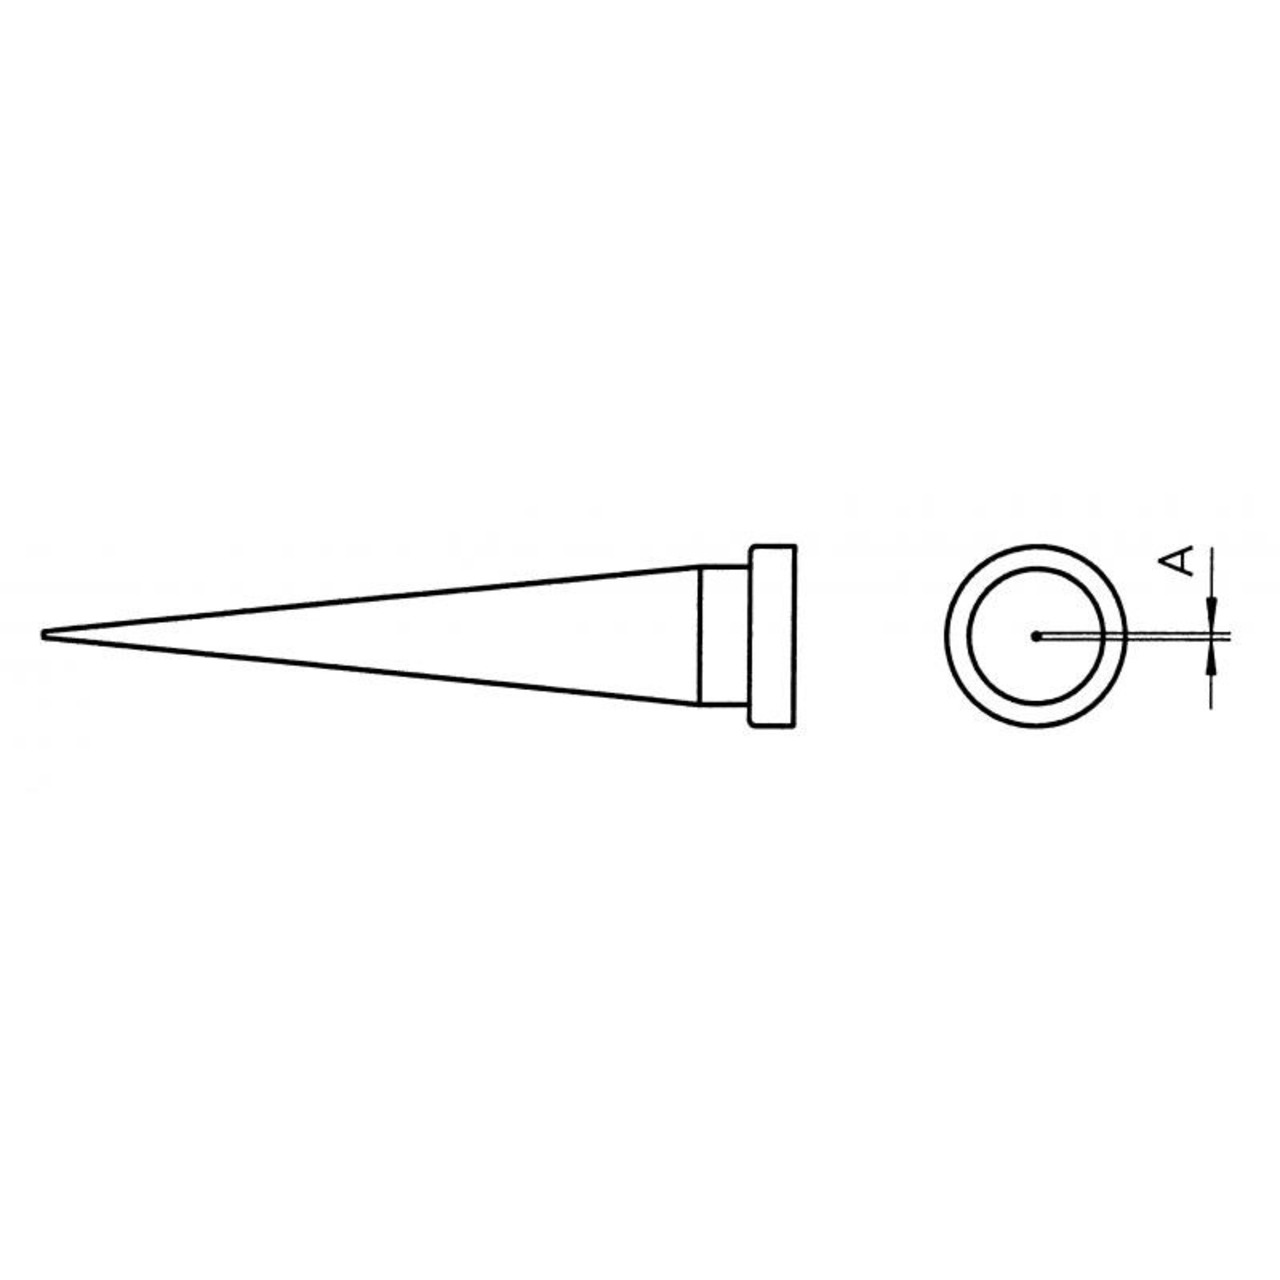 Weller Ersatzlötspitze LT S- konisch- 0-4 mm